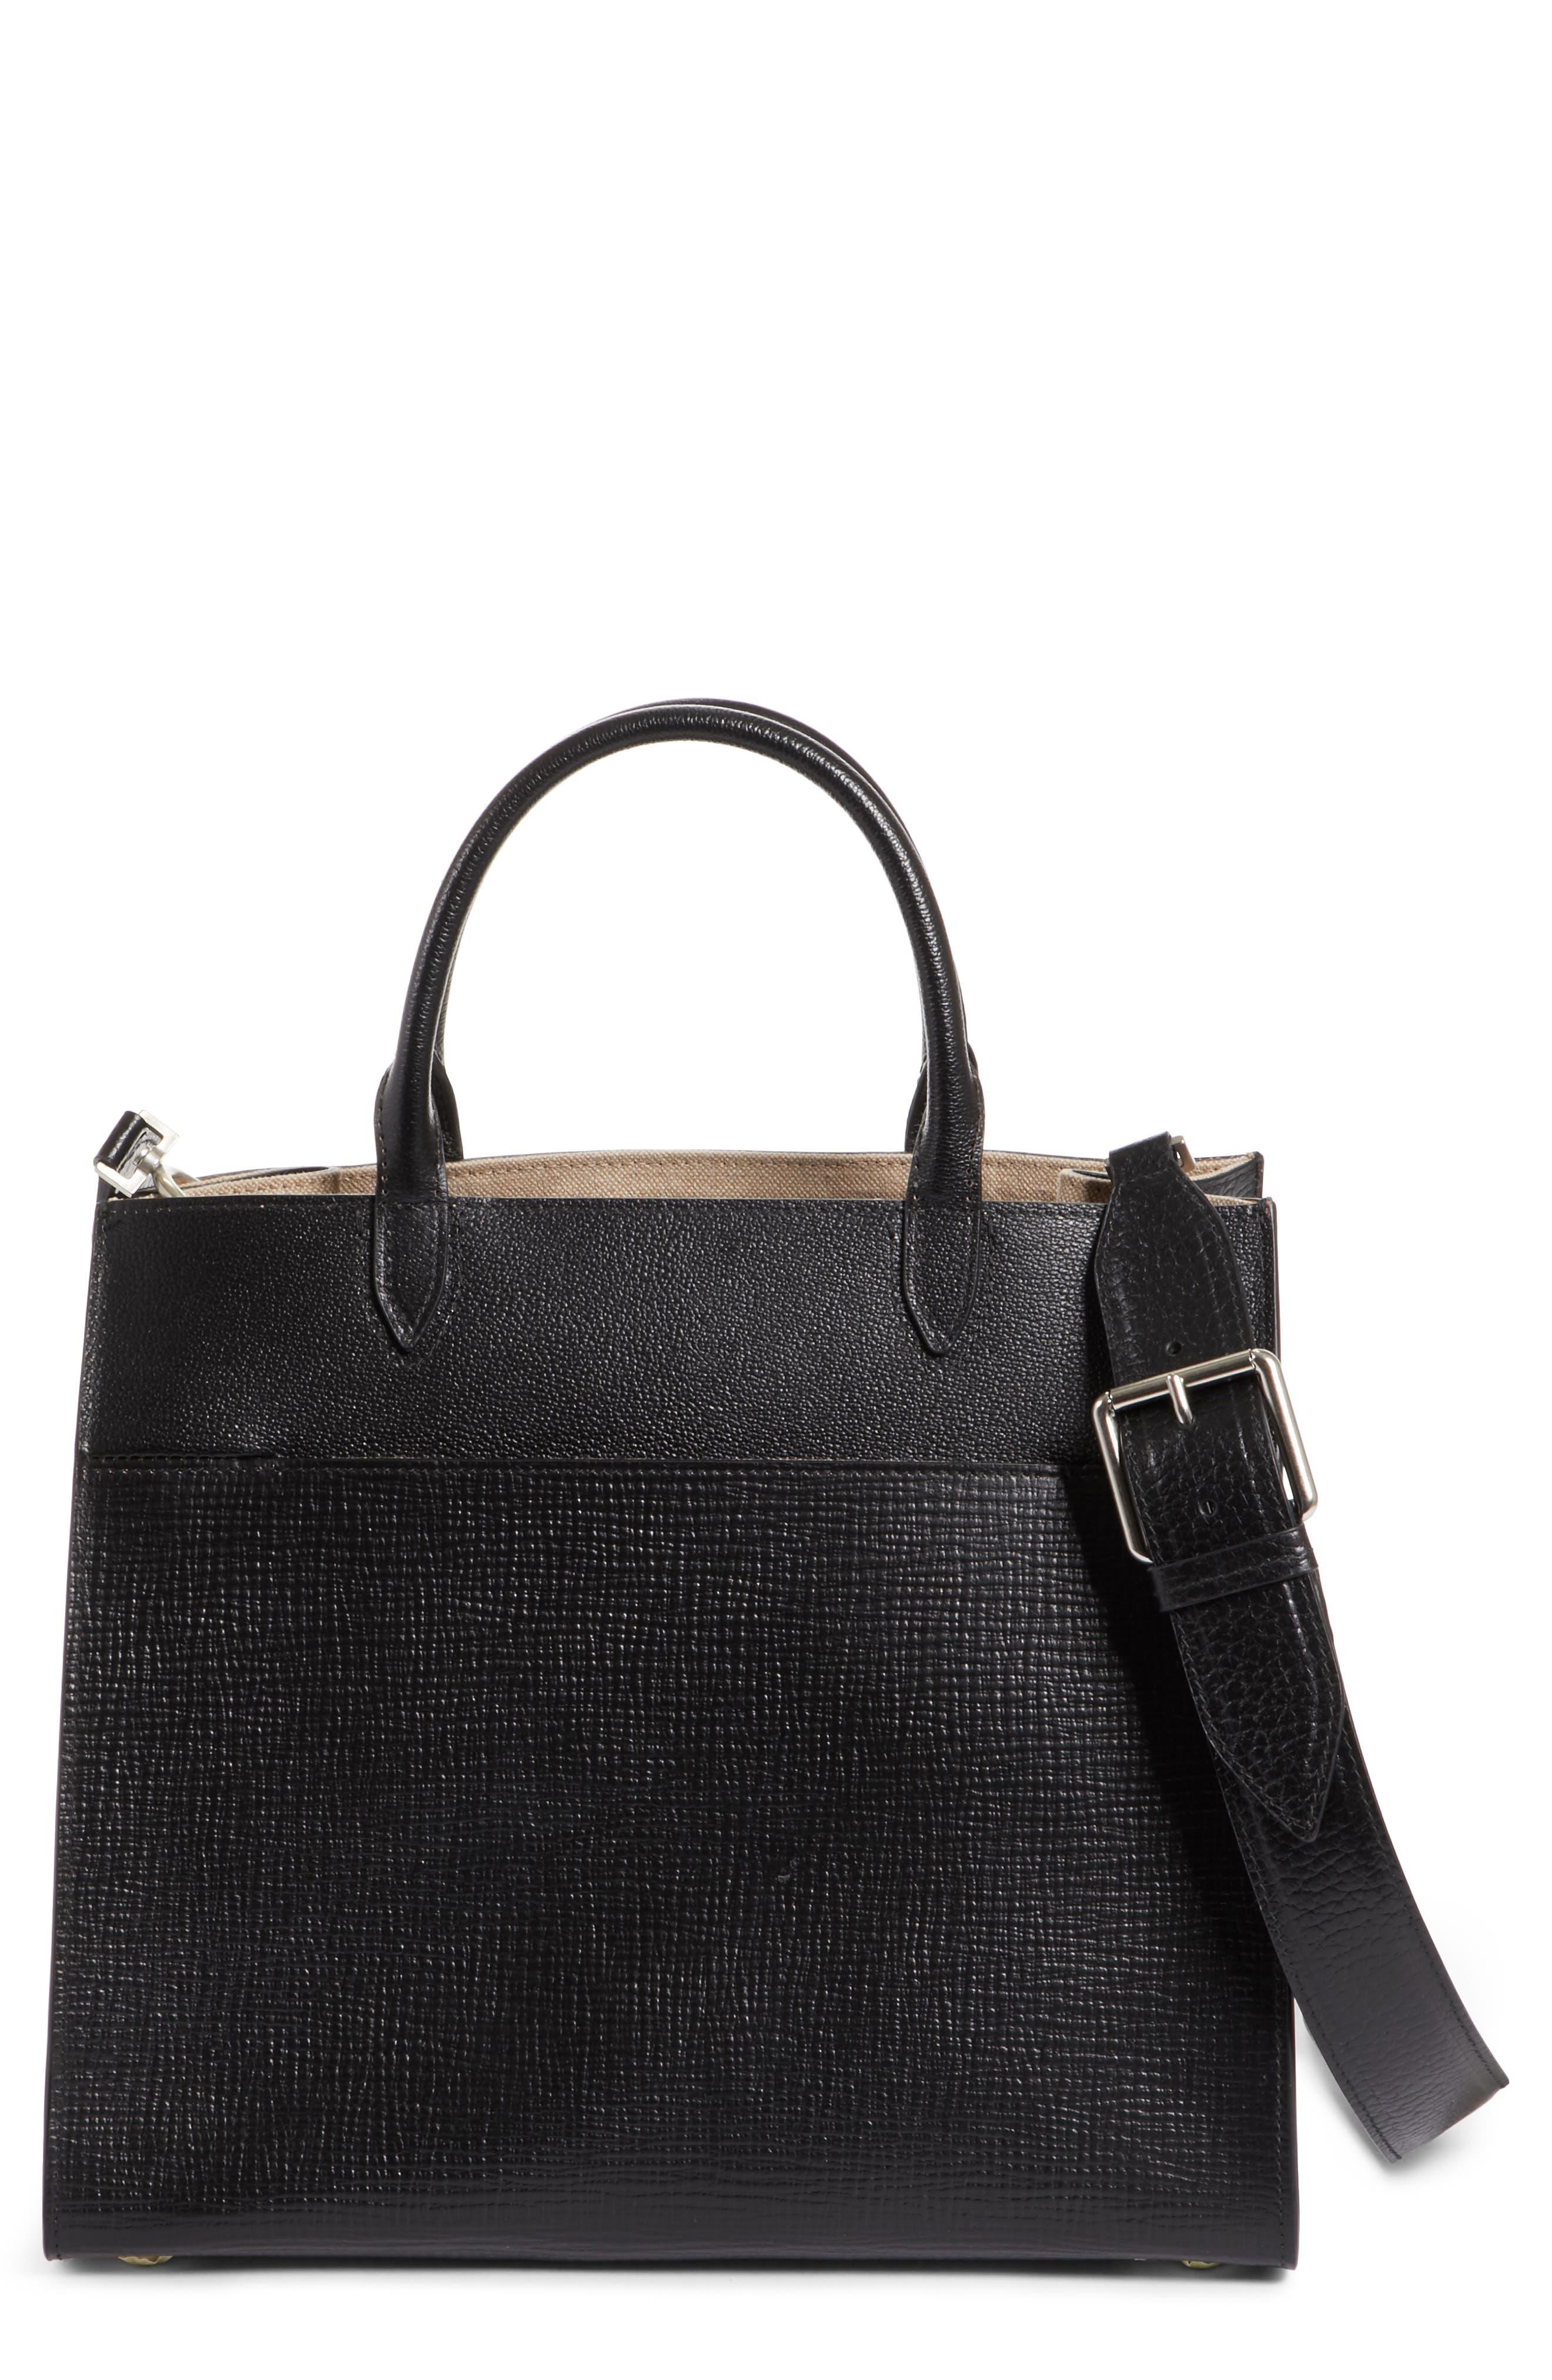 Bonded Leather Satchel,                             Main thumbnail 1, color,                             Black